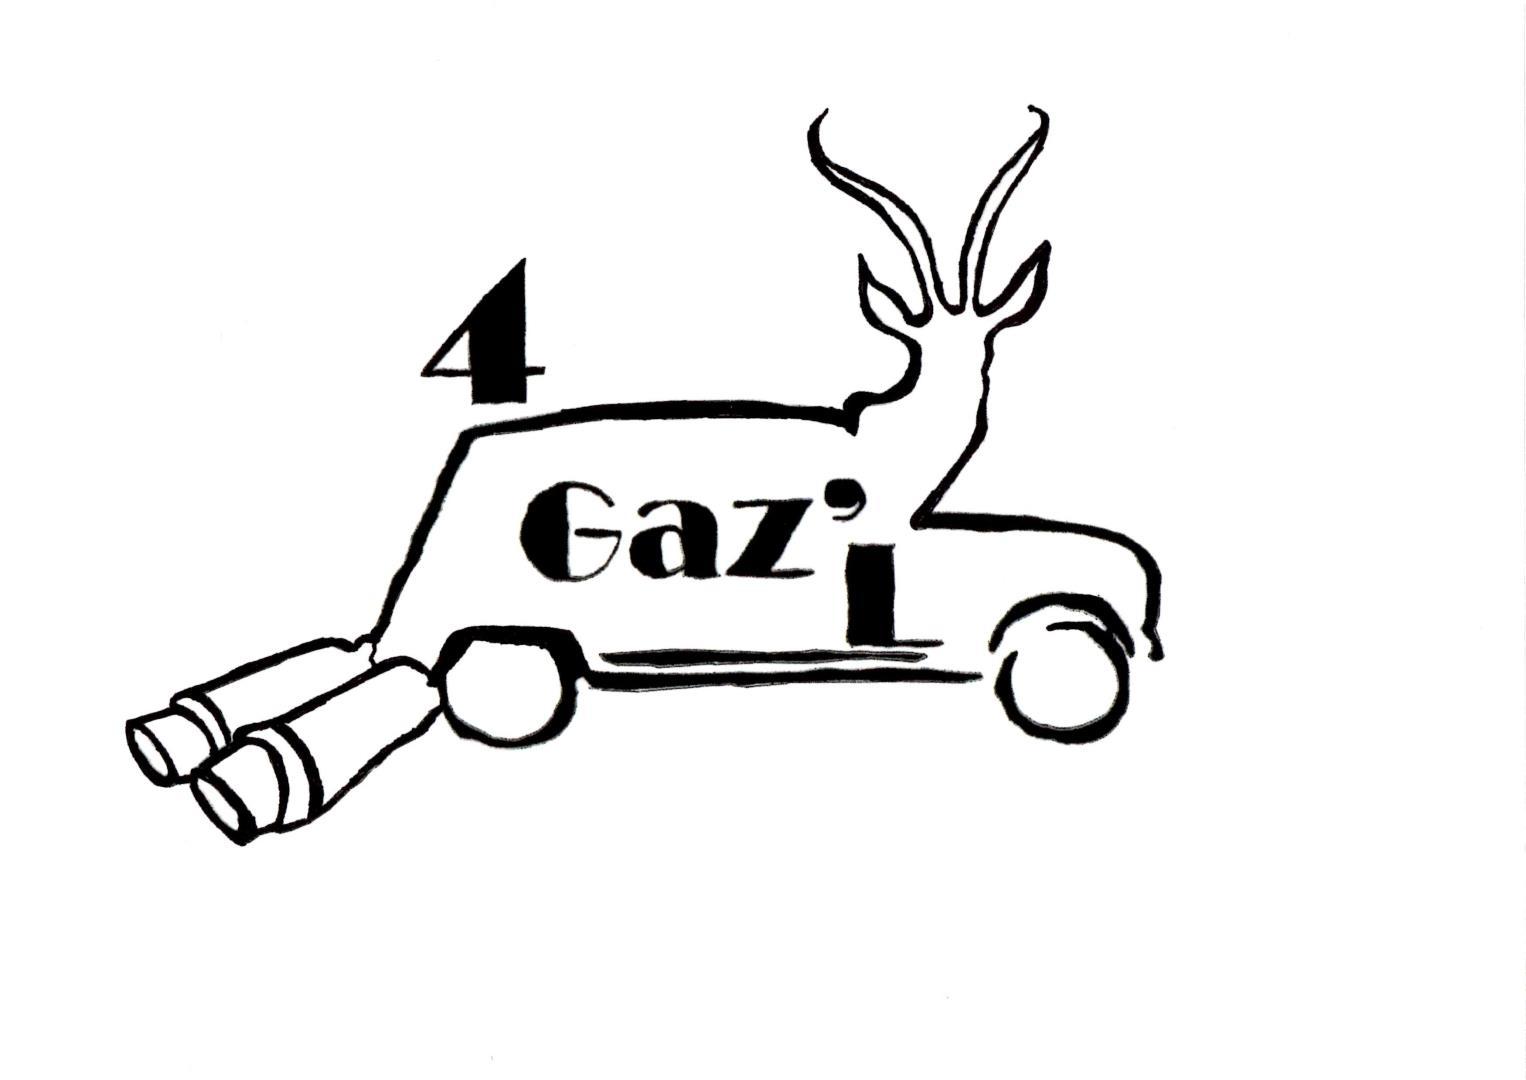 Association - 4 GAZ'L